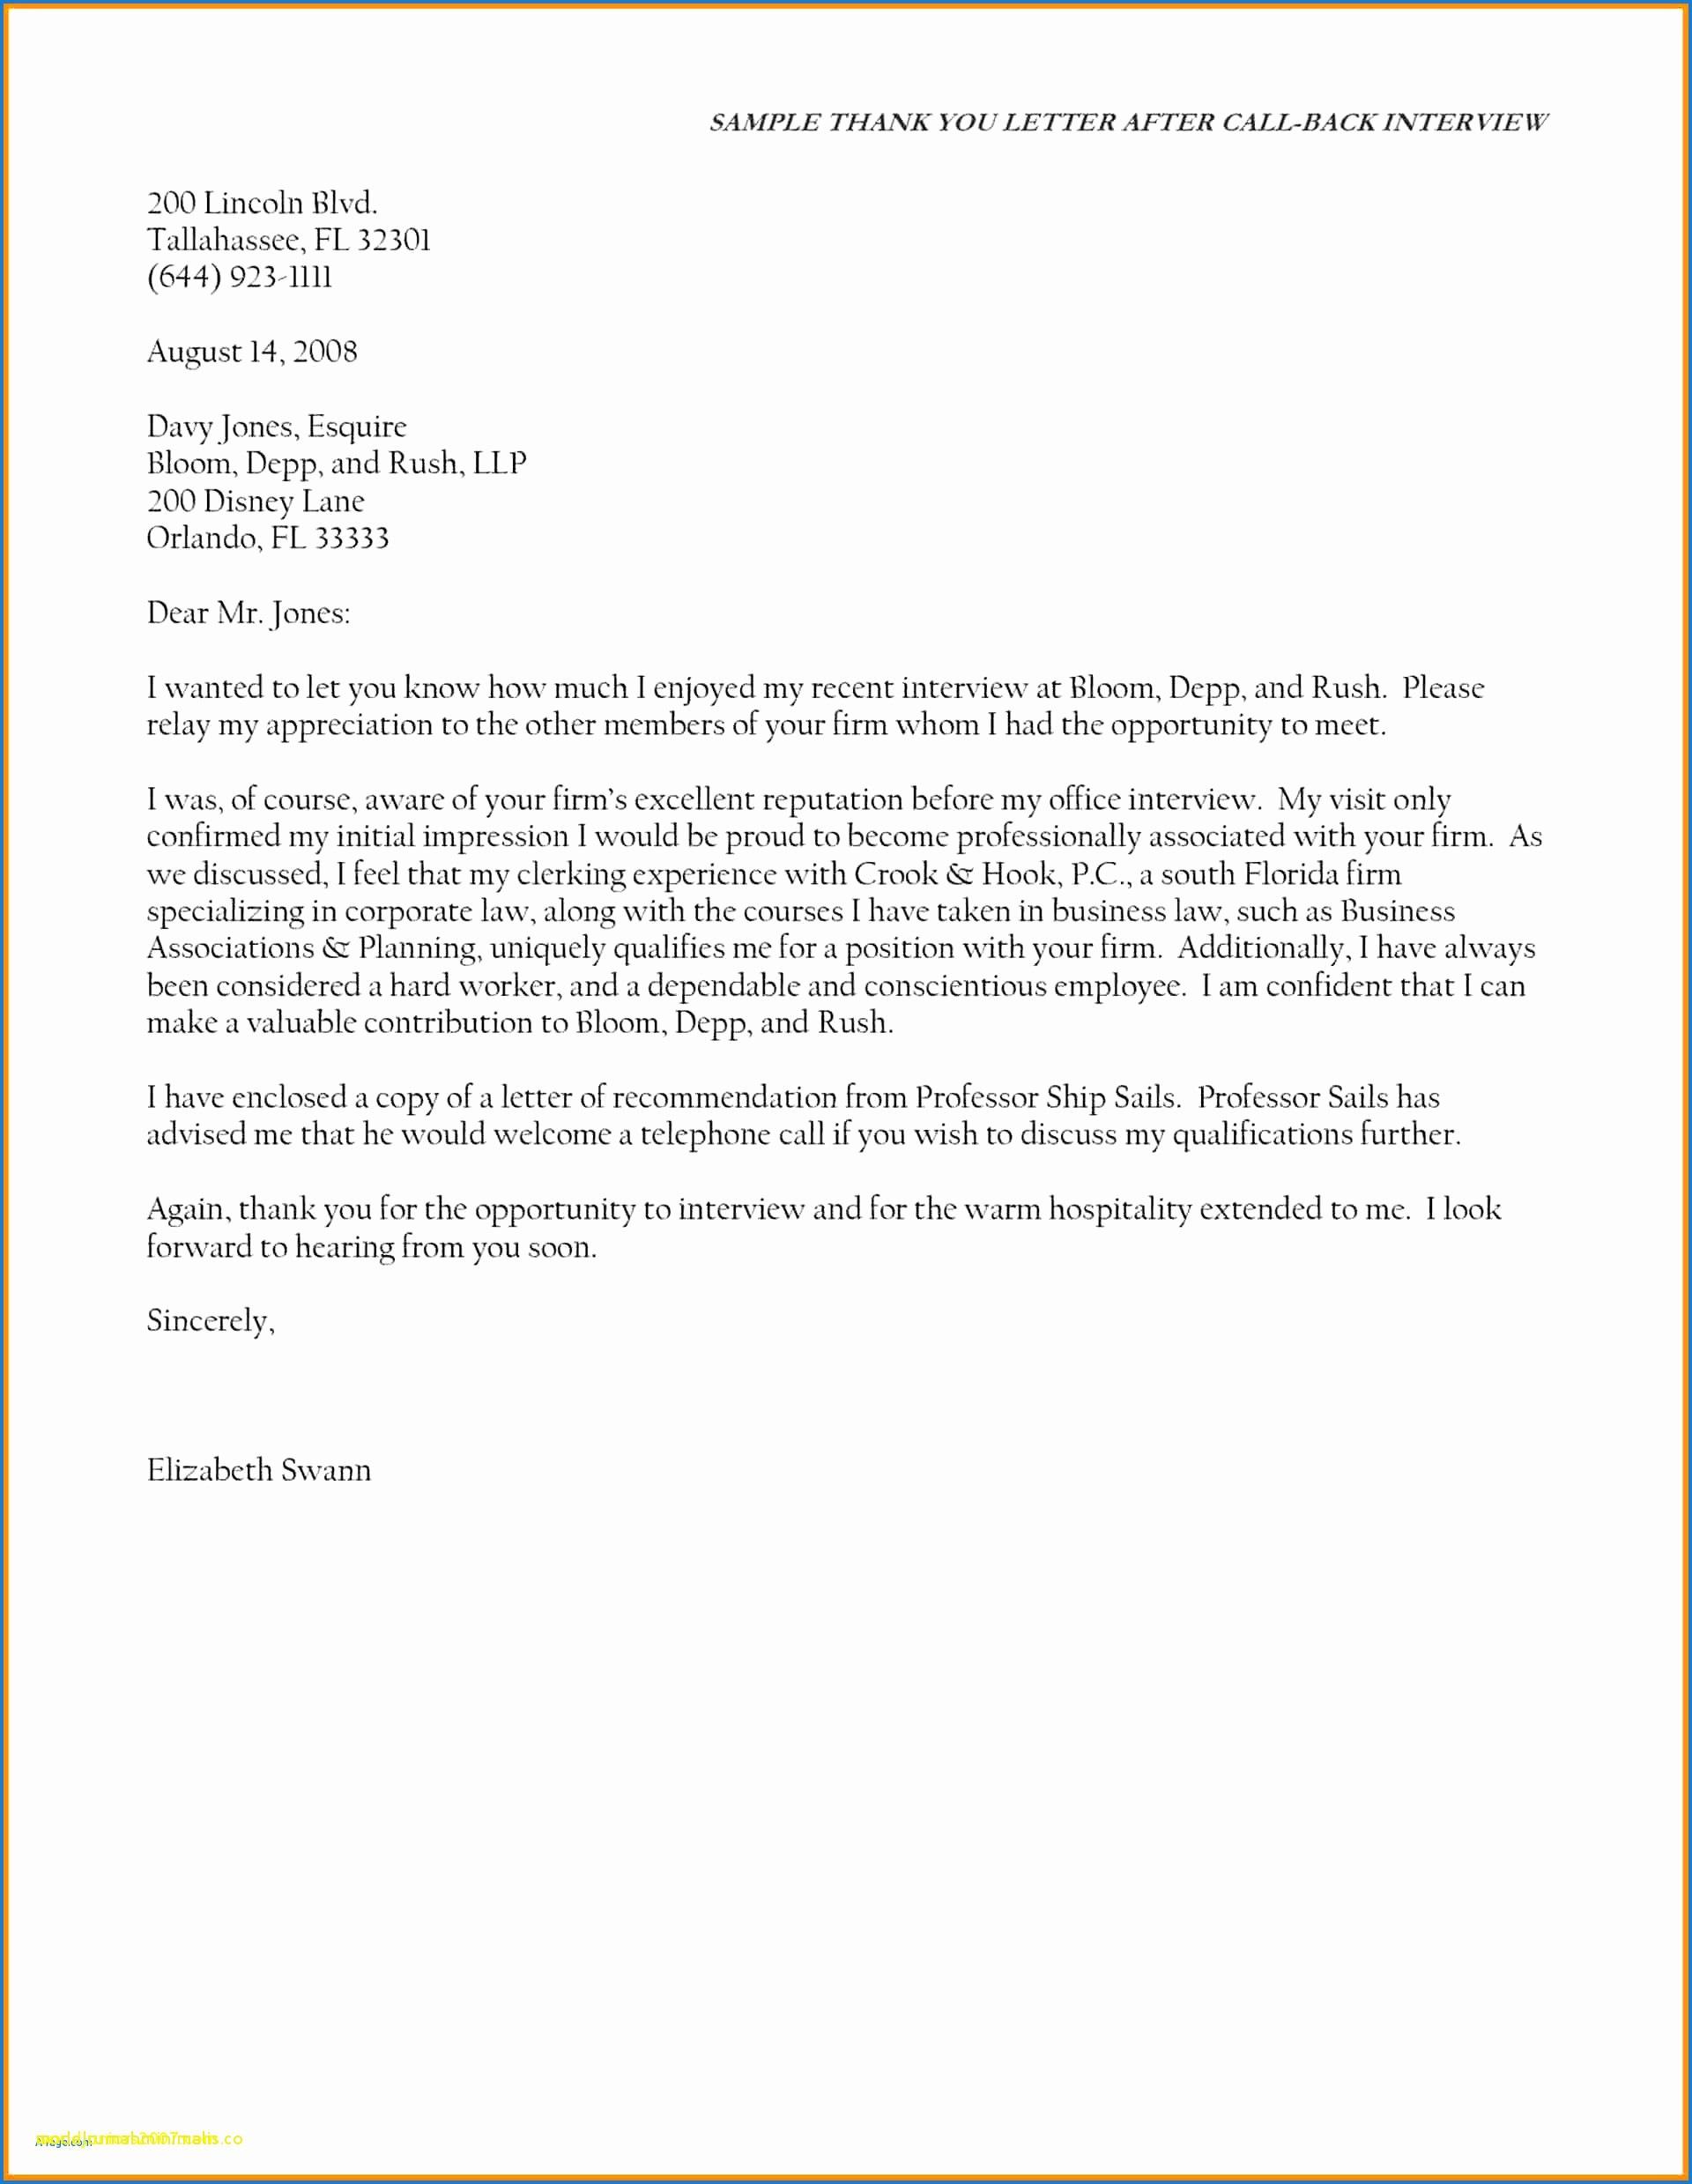 Disney Surprise Letter Template - Luxury Disney Surprise Letter Template